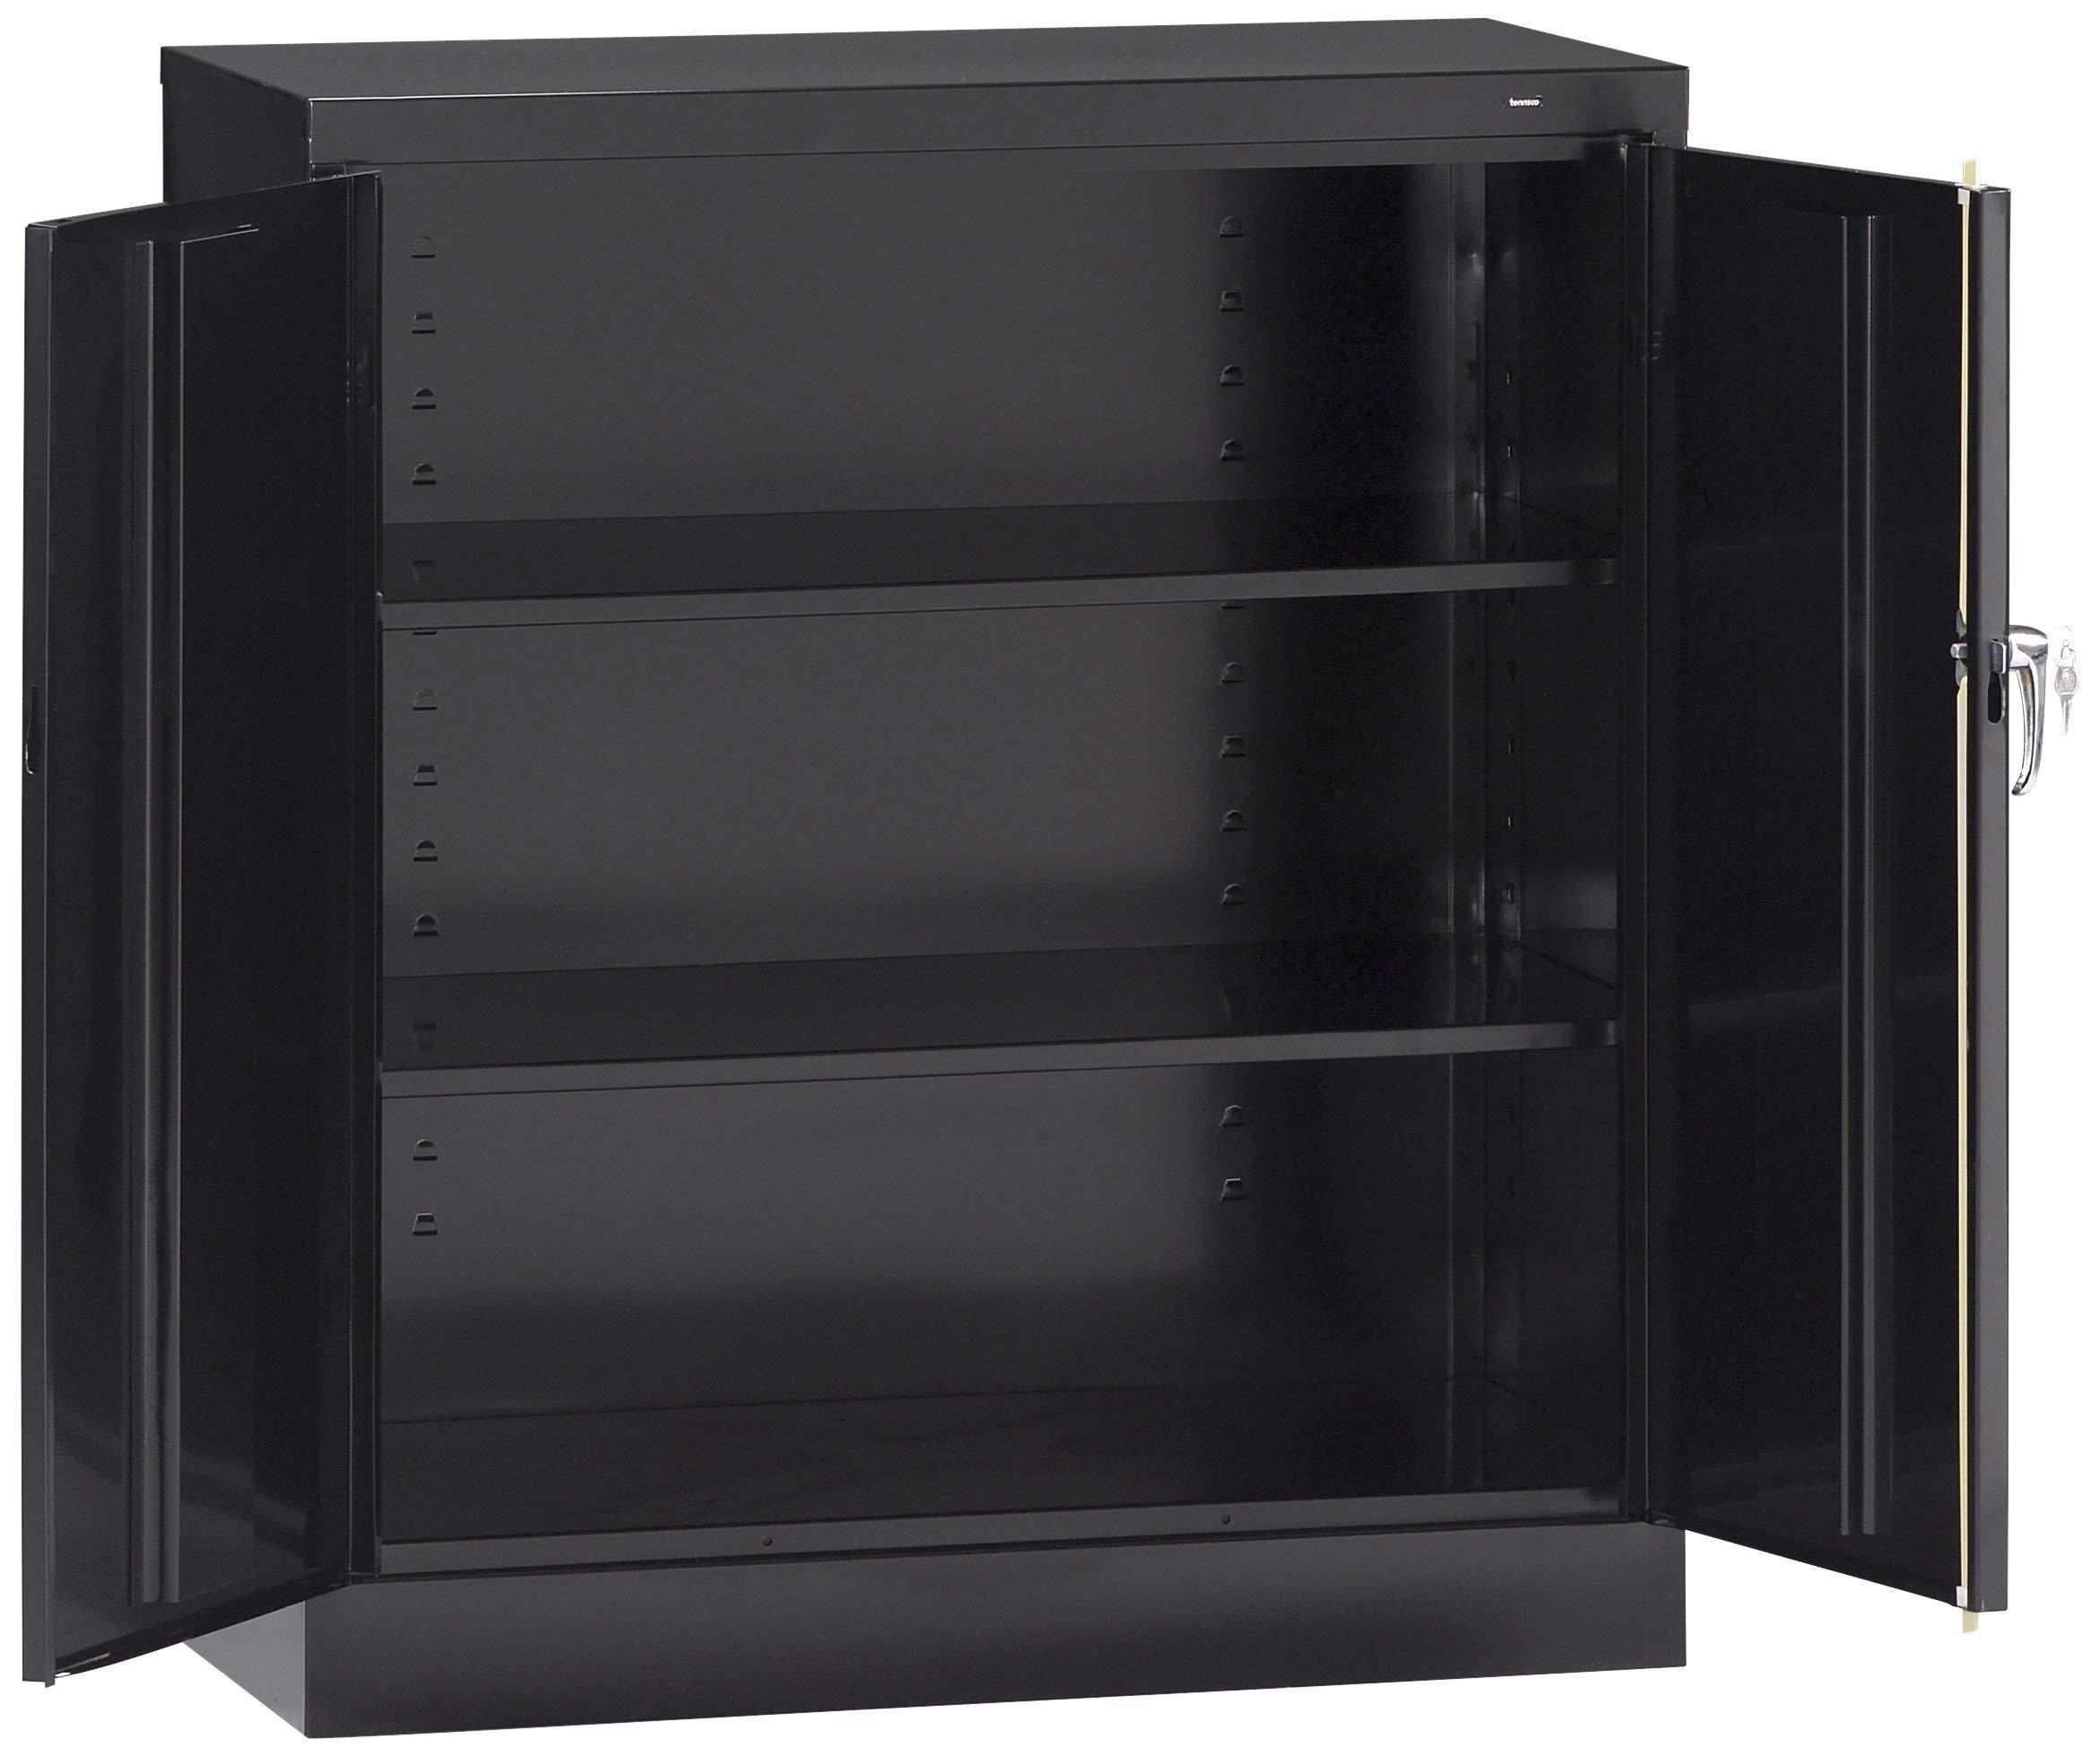 Tennsco 4218 24 Gauge Steel Standard Welded Counter High Cabinet, 2 Shelves, 150 lbs Capacity per Shelf, 36'' Width x 42'' Height x 18'' Depth, Black (Renewed) by Tennsco (Image #1)